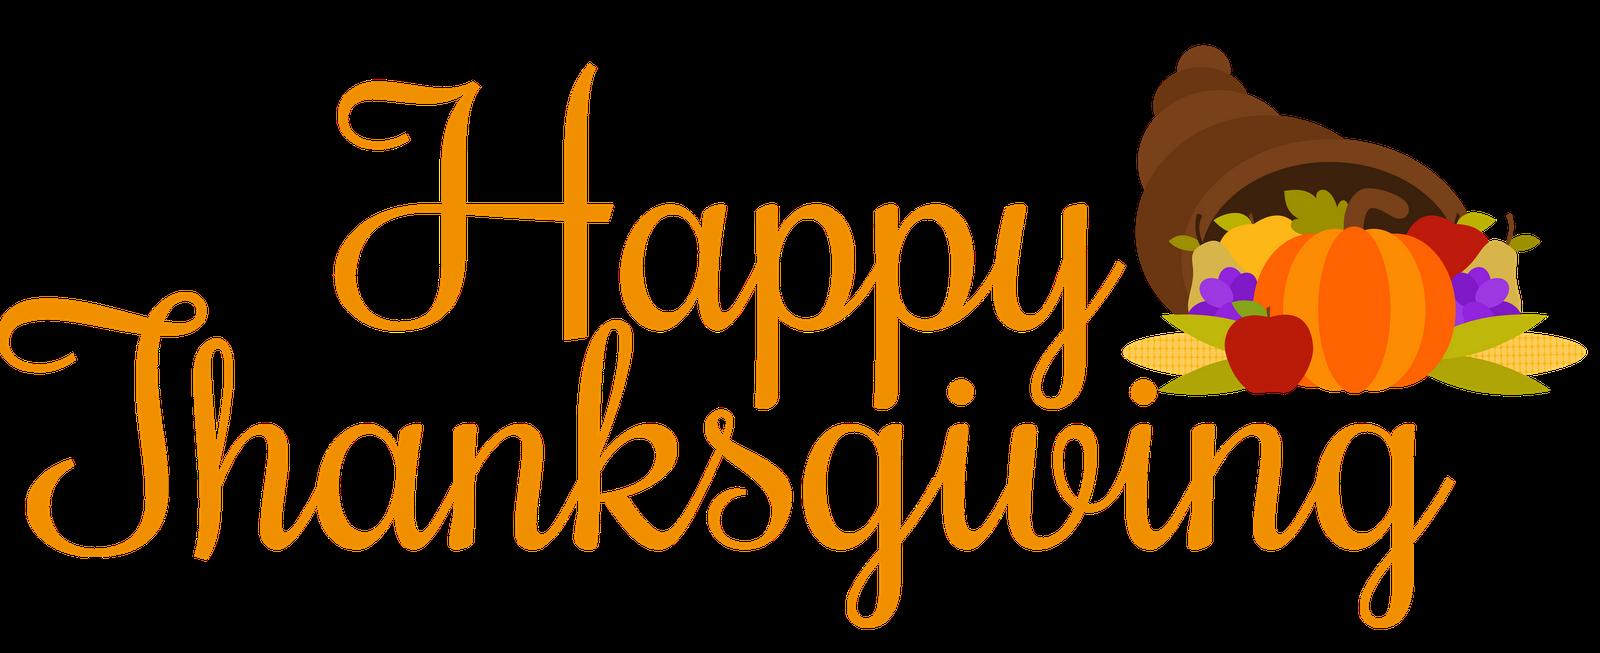 1745866-cornucopia-happy-thanksgiving-png-1600_653_preview